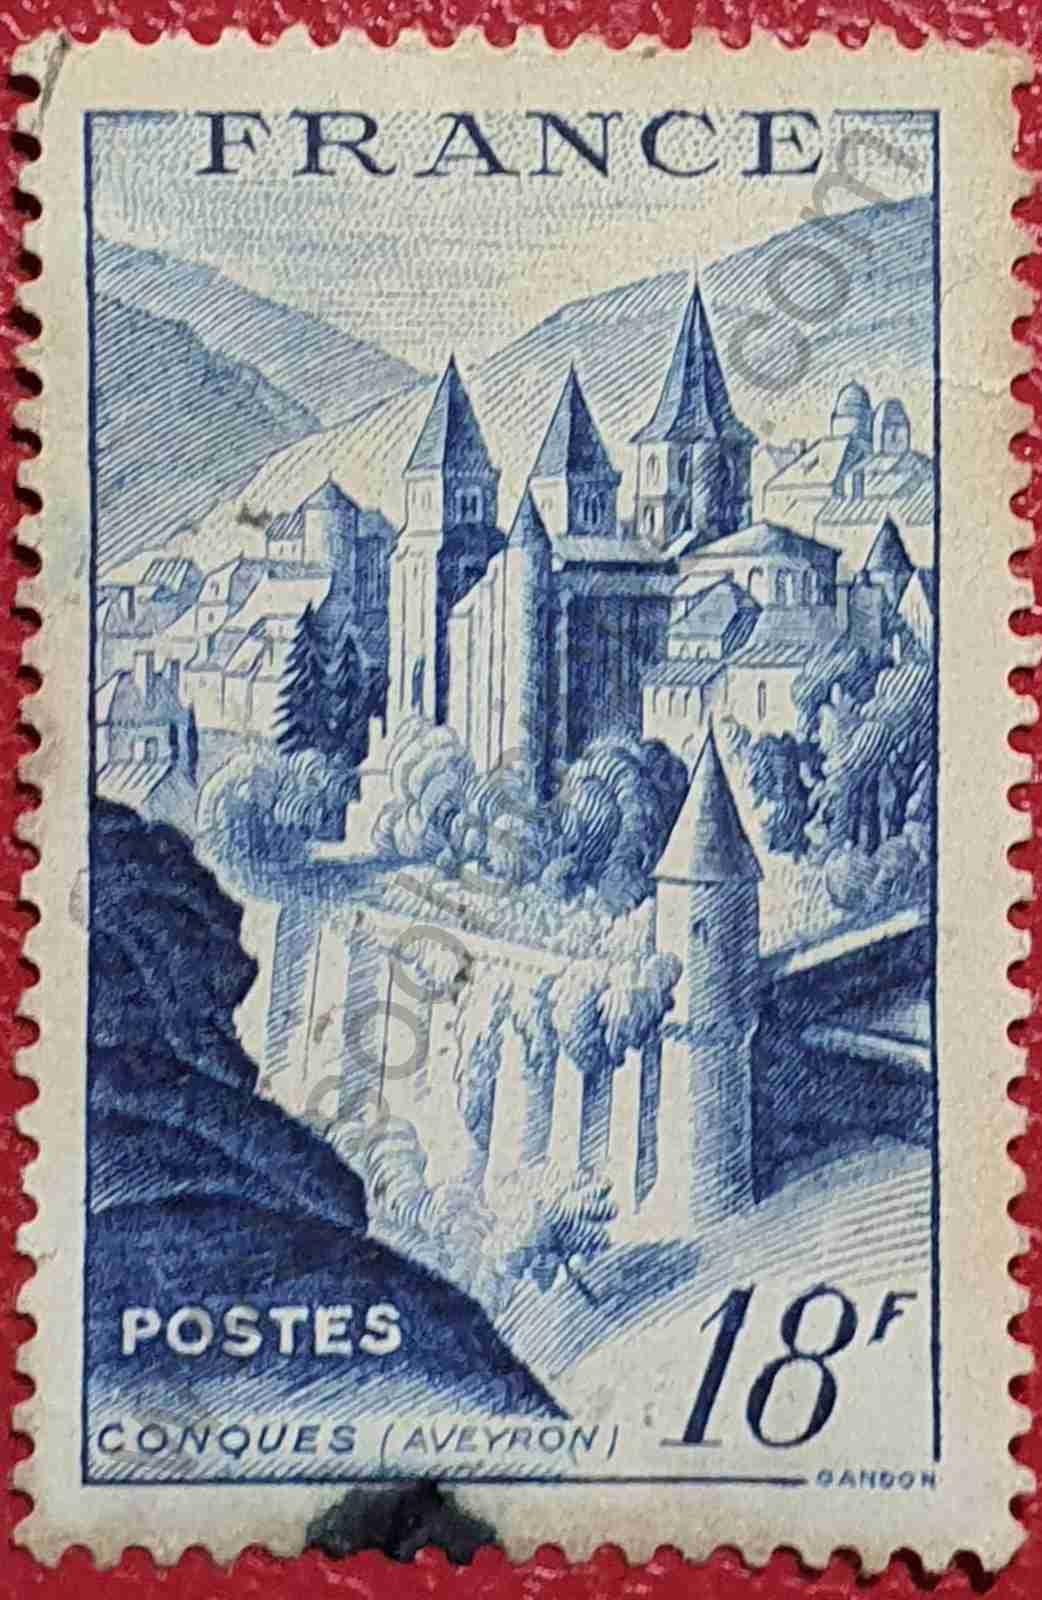 Abadía de Conques - Sello Francia 1948